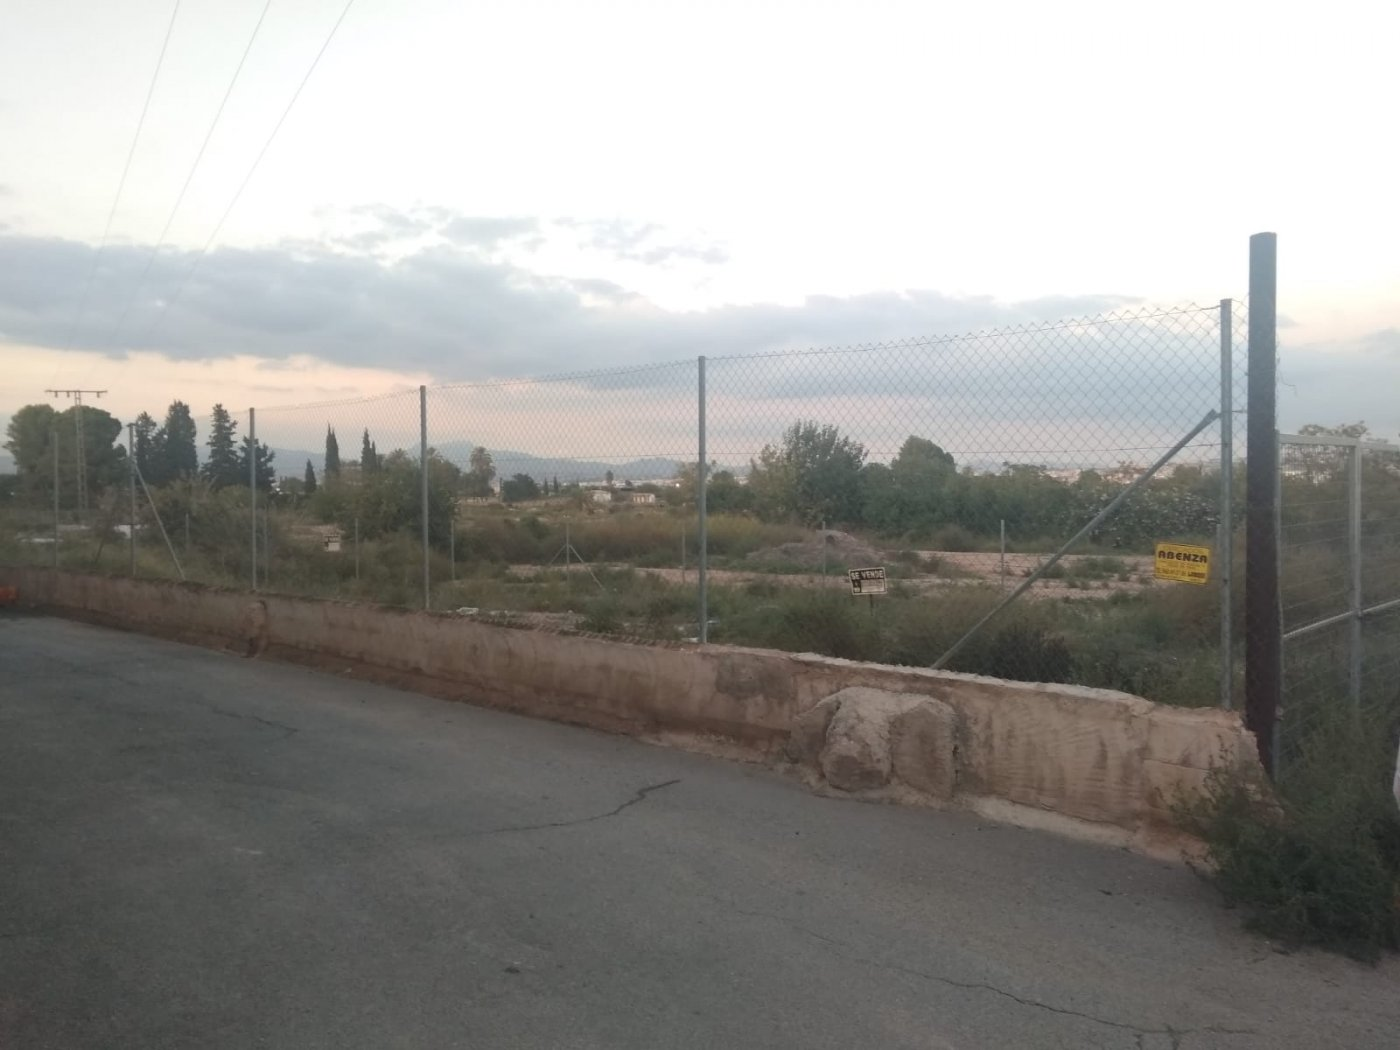 Terrenos urbanos - 02804